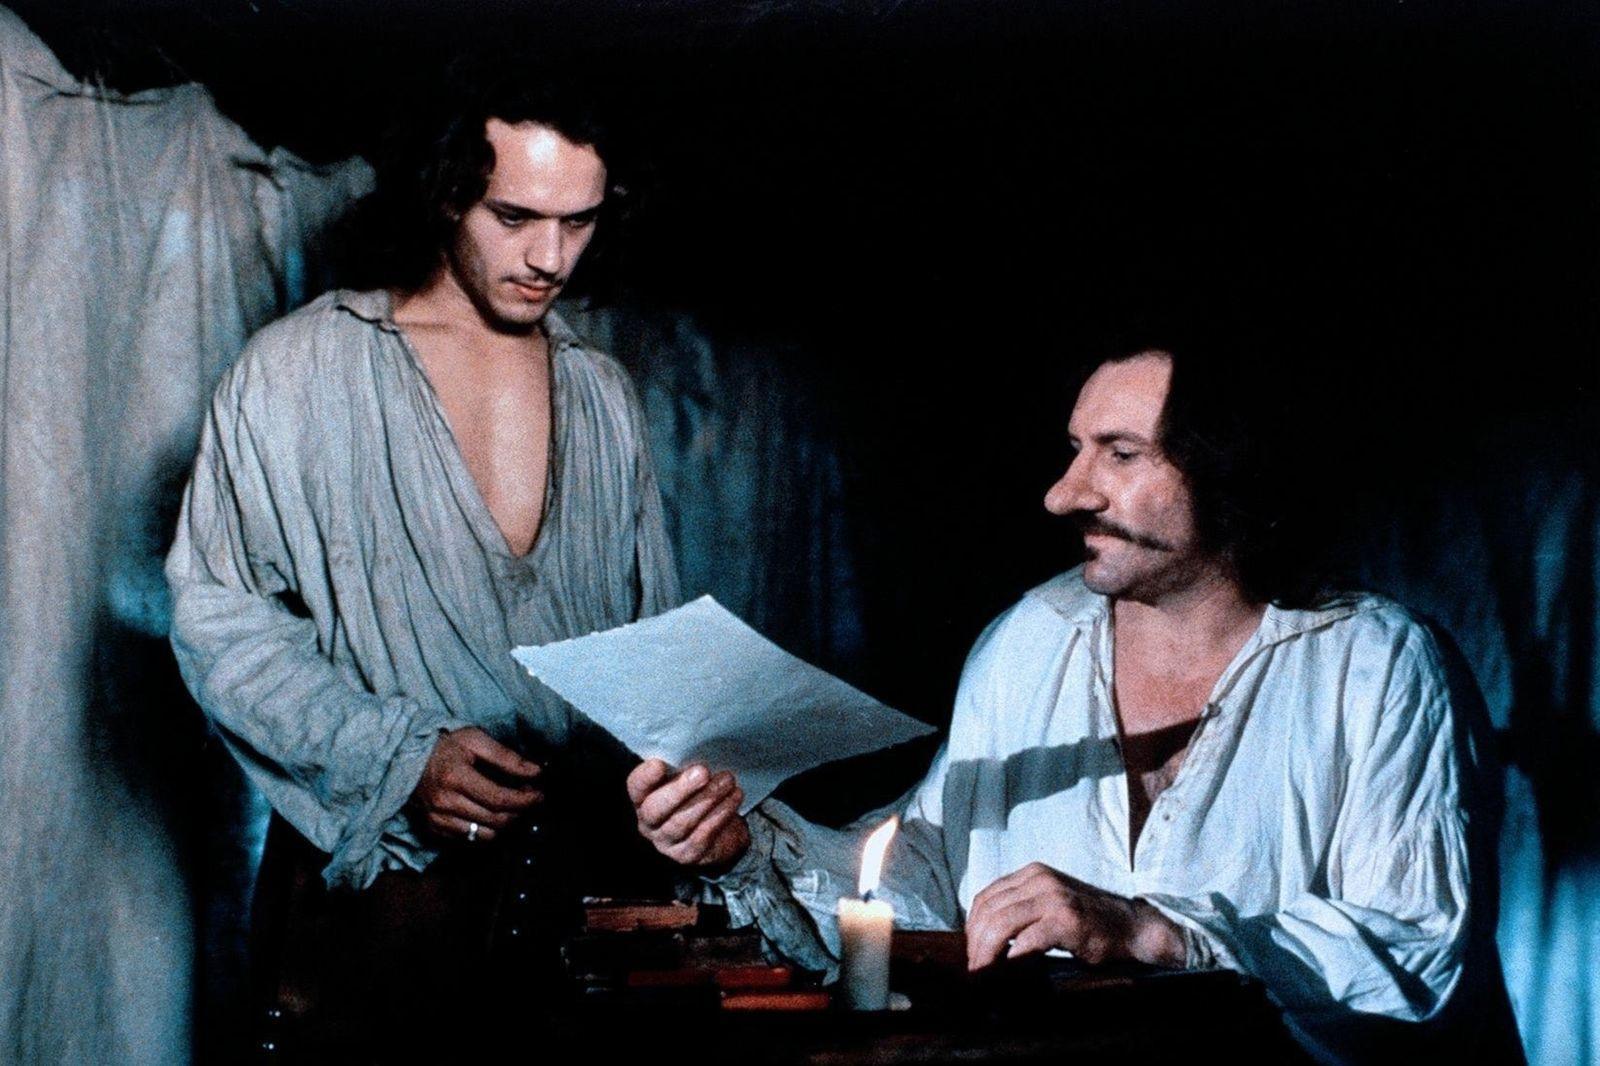 Cyrano von Bergerac / Cyrano de Bergerac